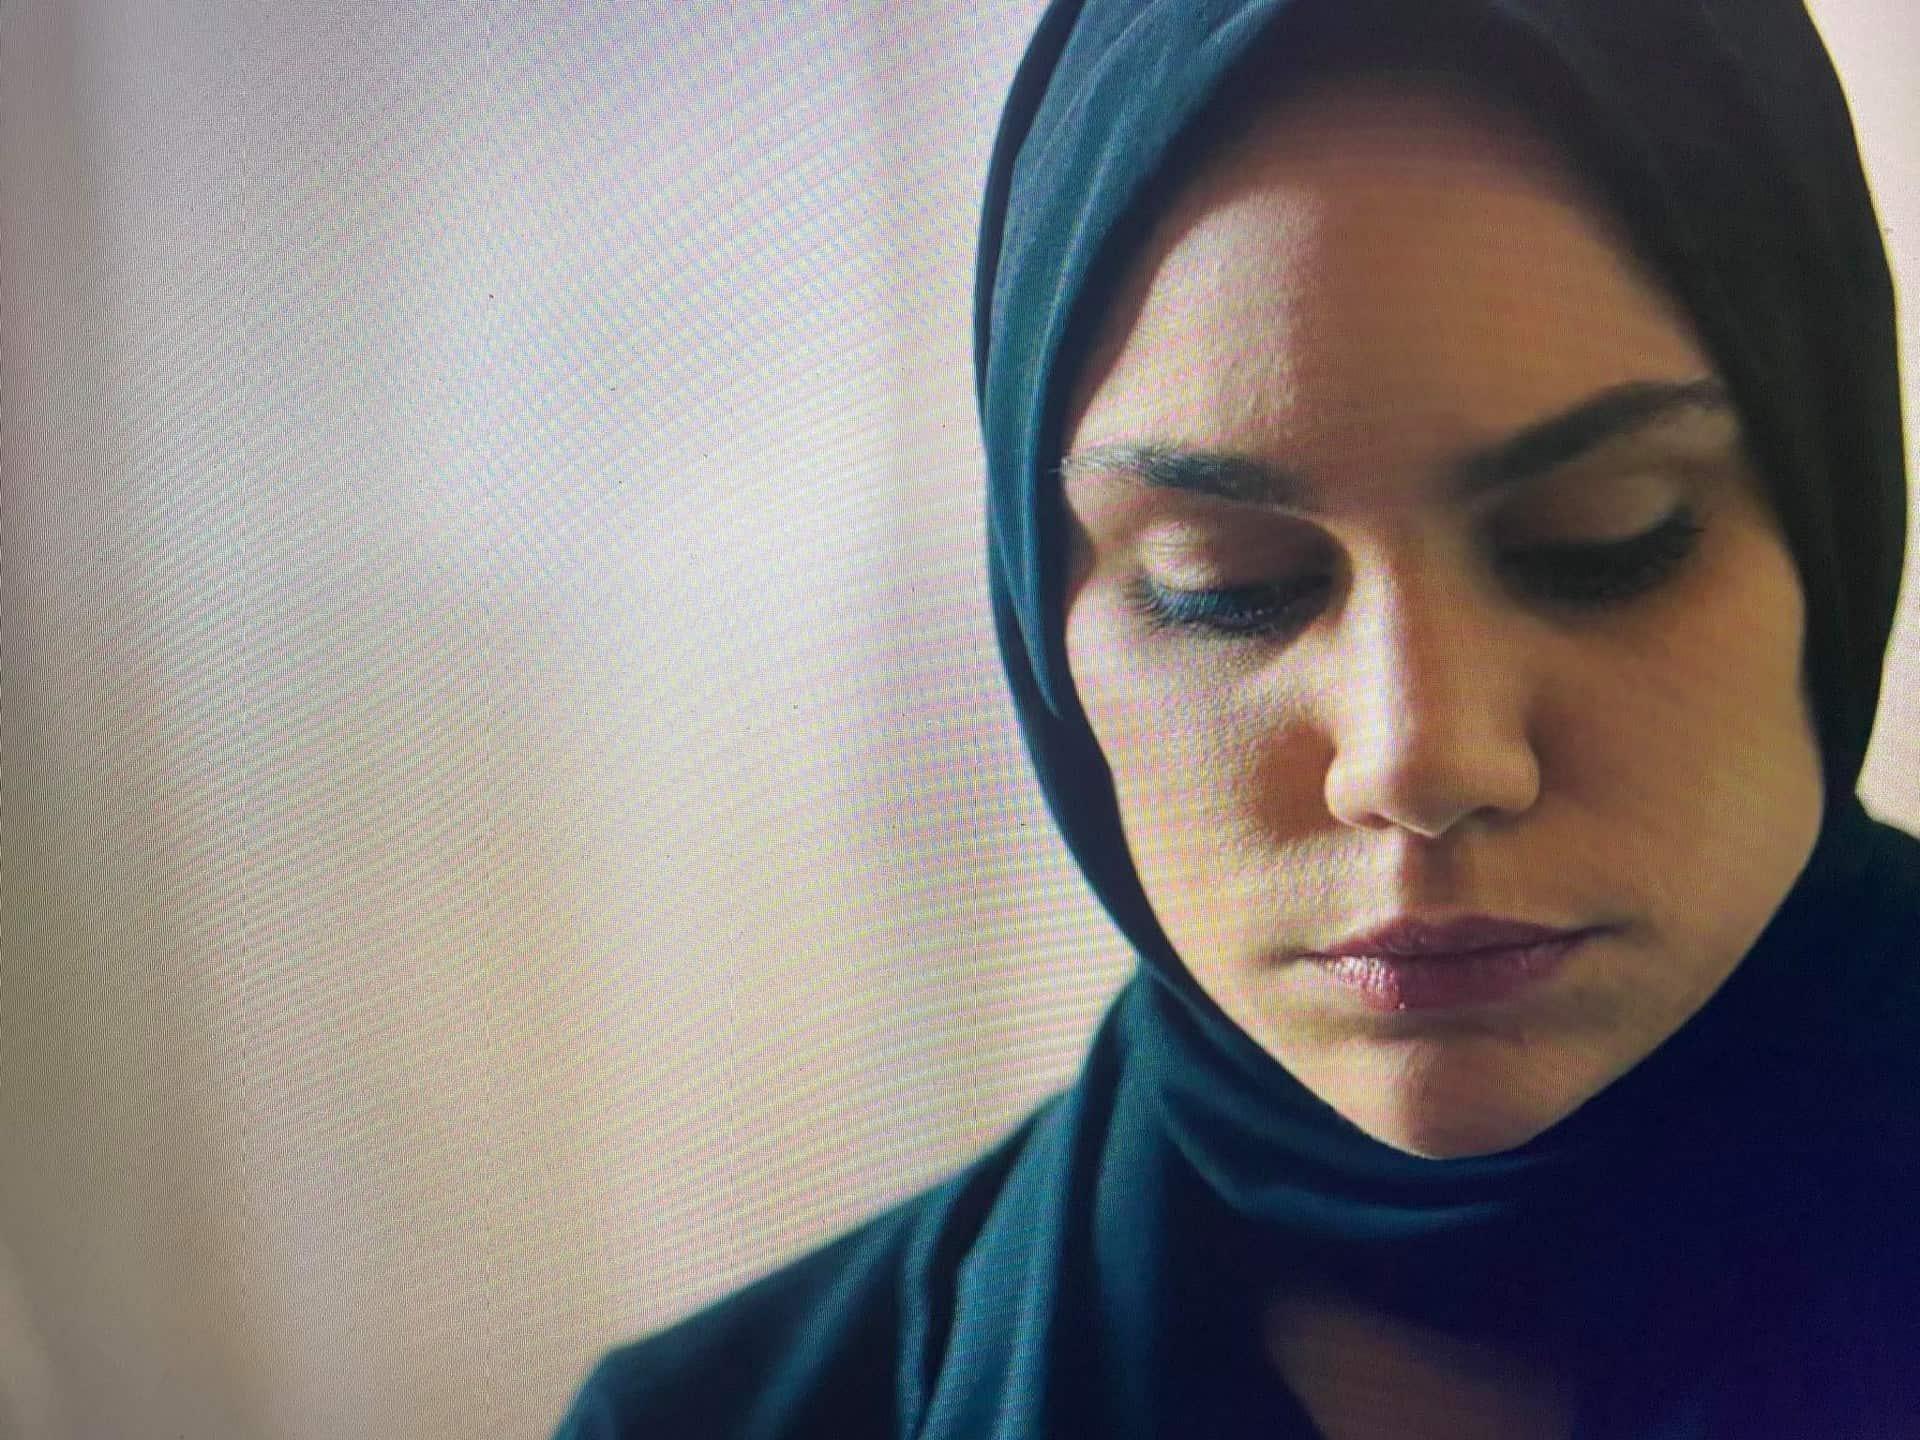 Skam Italia 4 la trama completa del sesto episodio: Sana delusa da Malik ed Eva